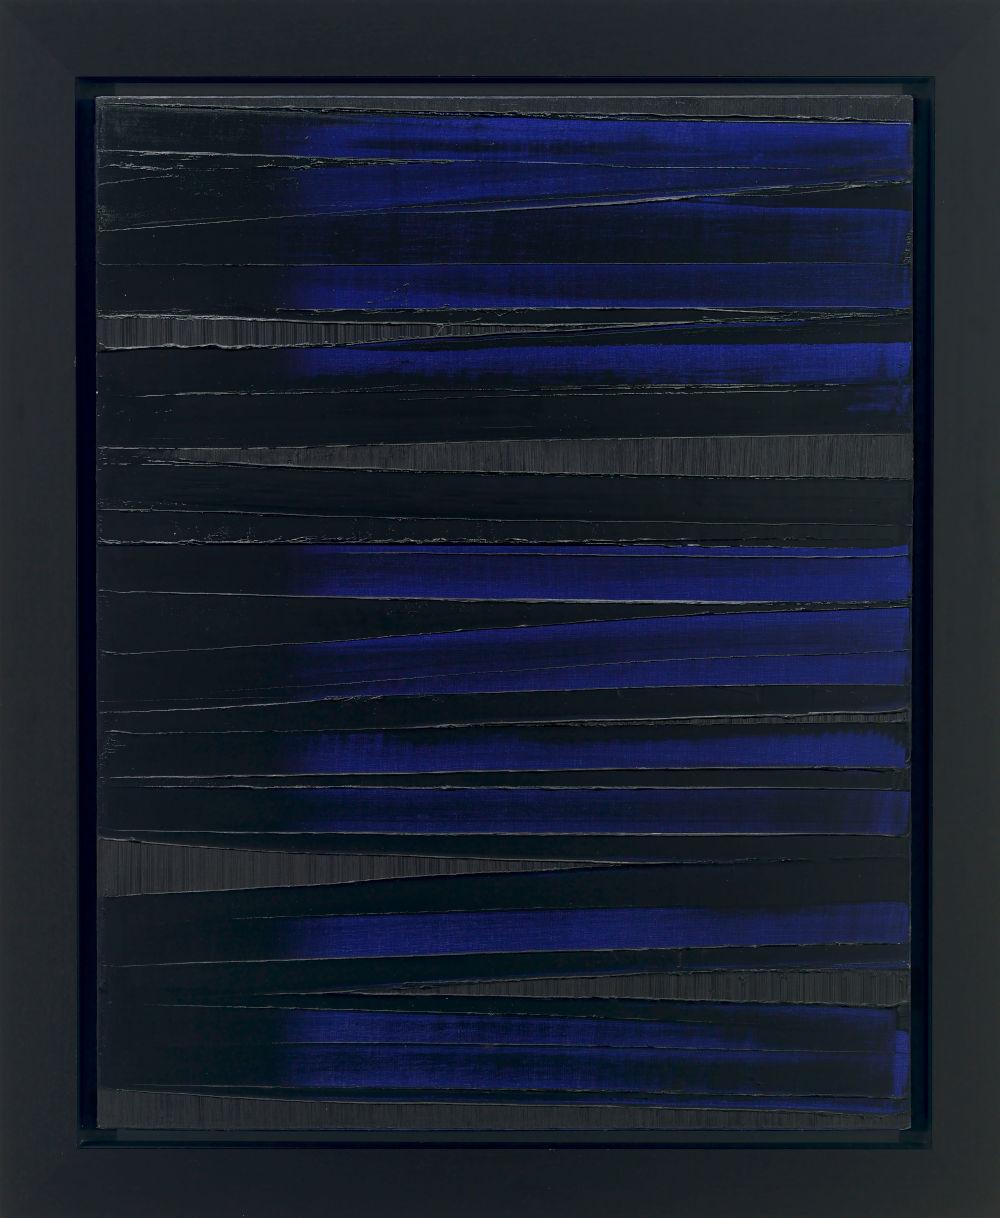 Peinture 130 x 102 cm, 27 août 1986